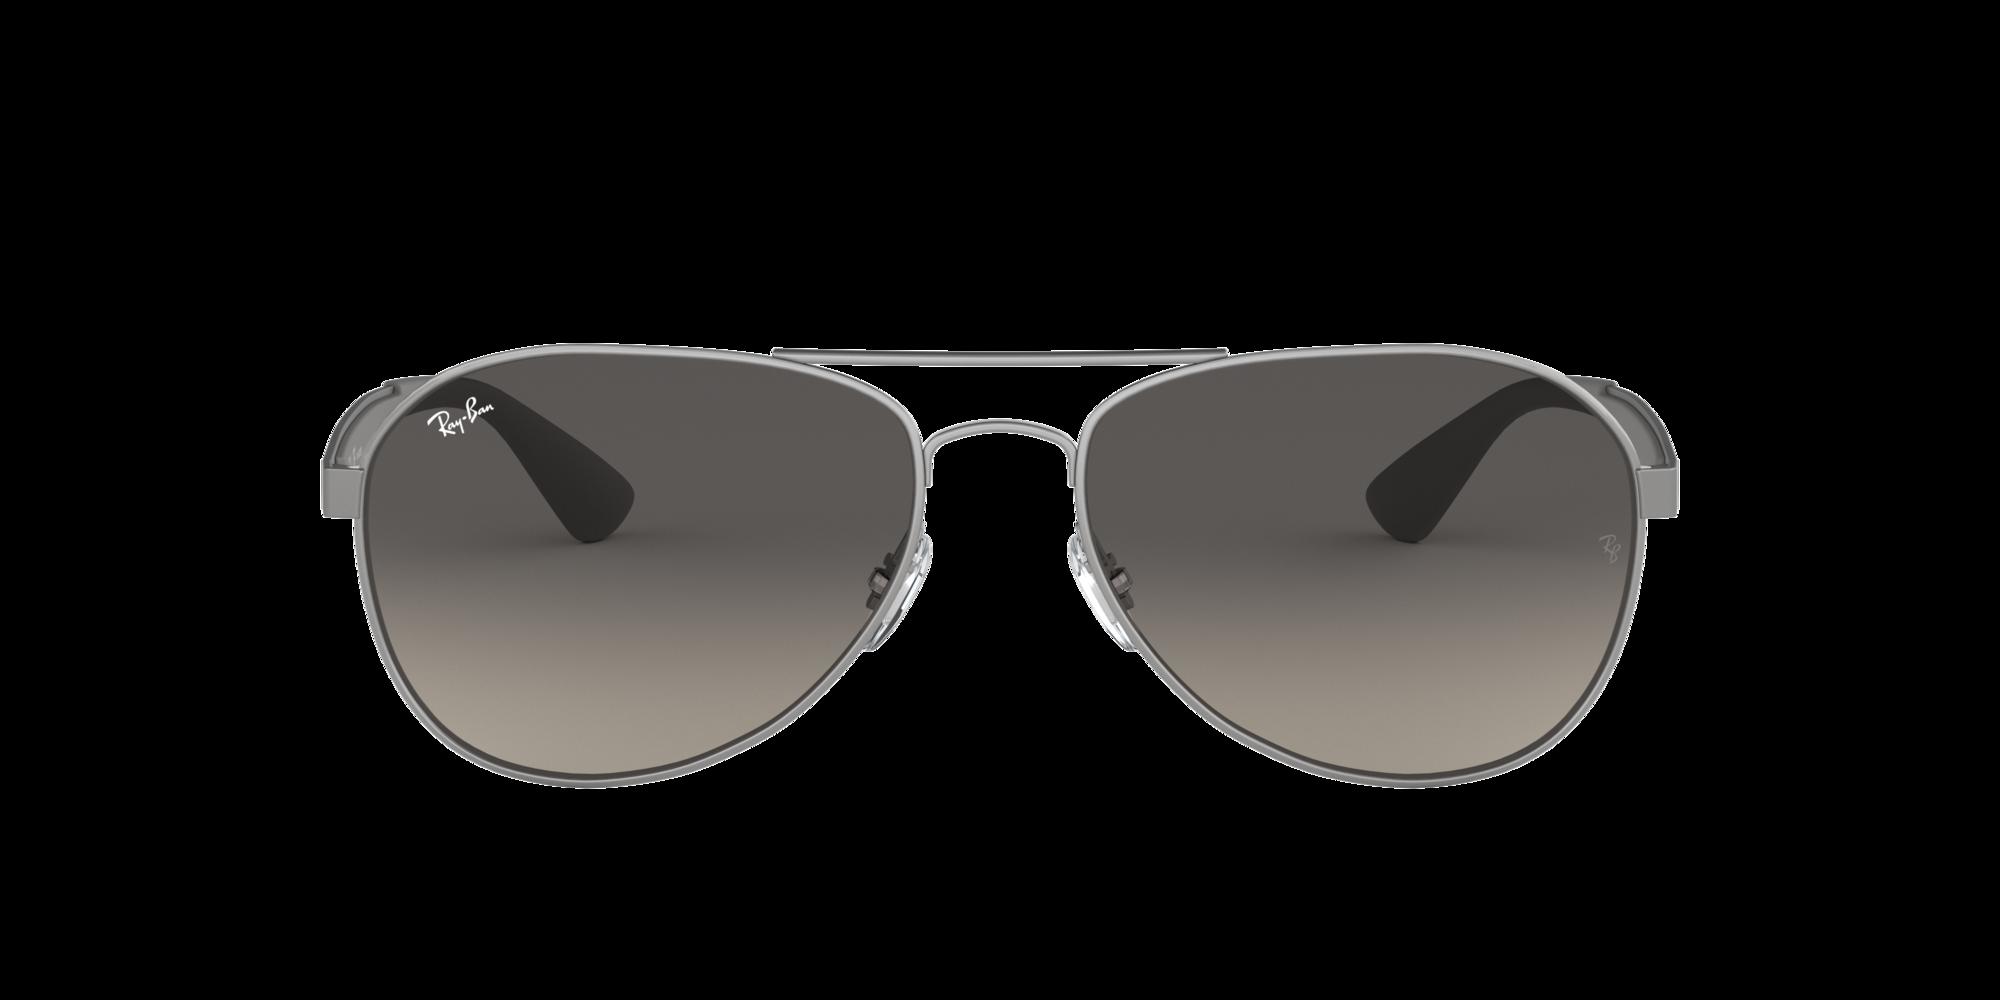 Image for RB3549 58 from LensCrafters | Glasses, Prescription Glasses Online, Eyewear